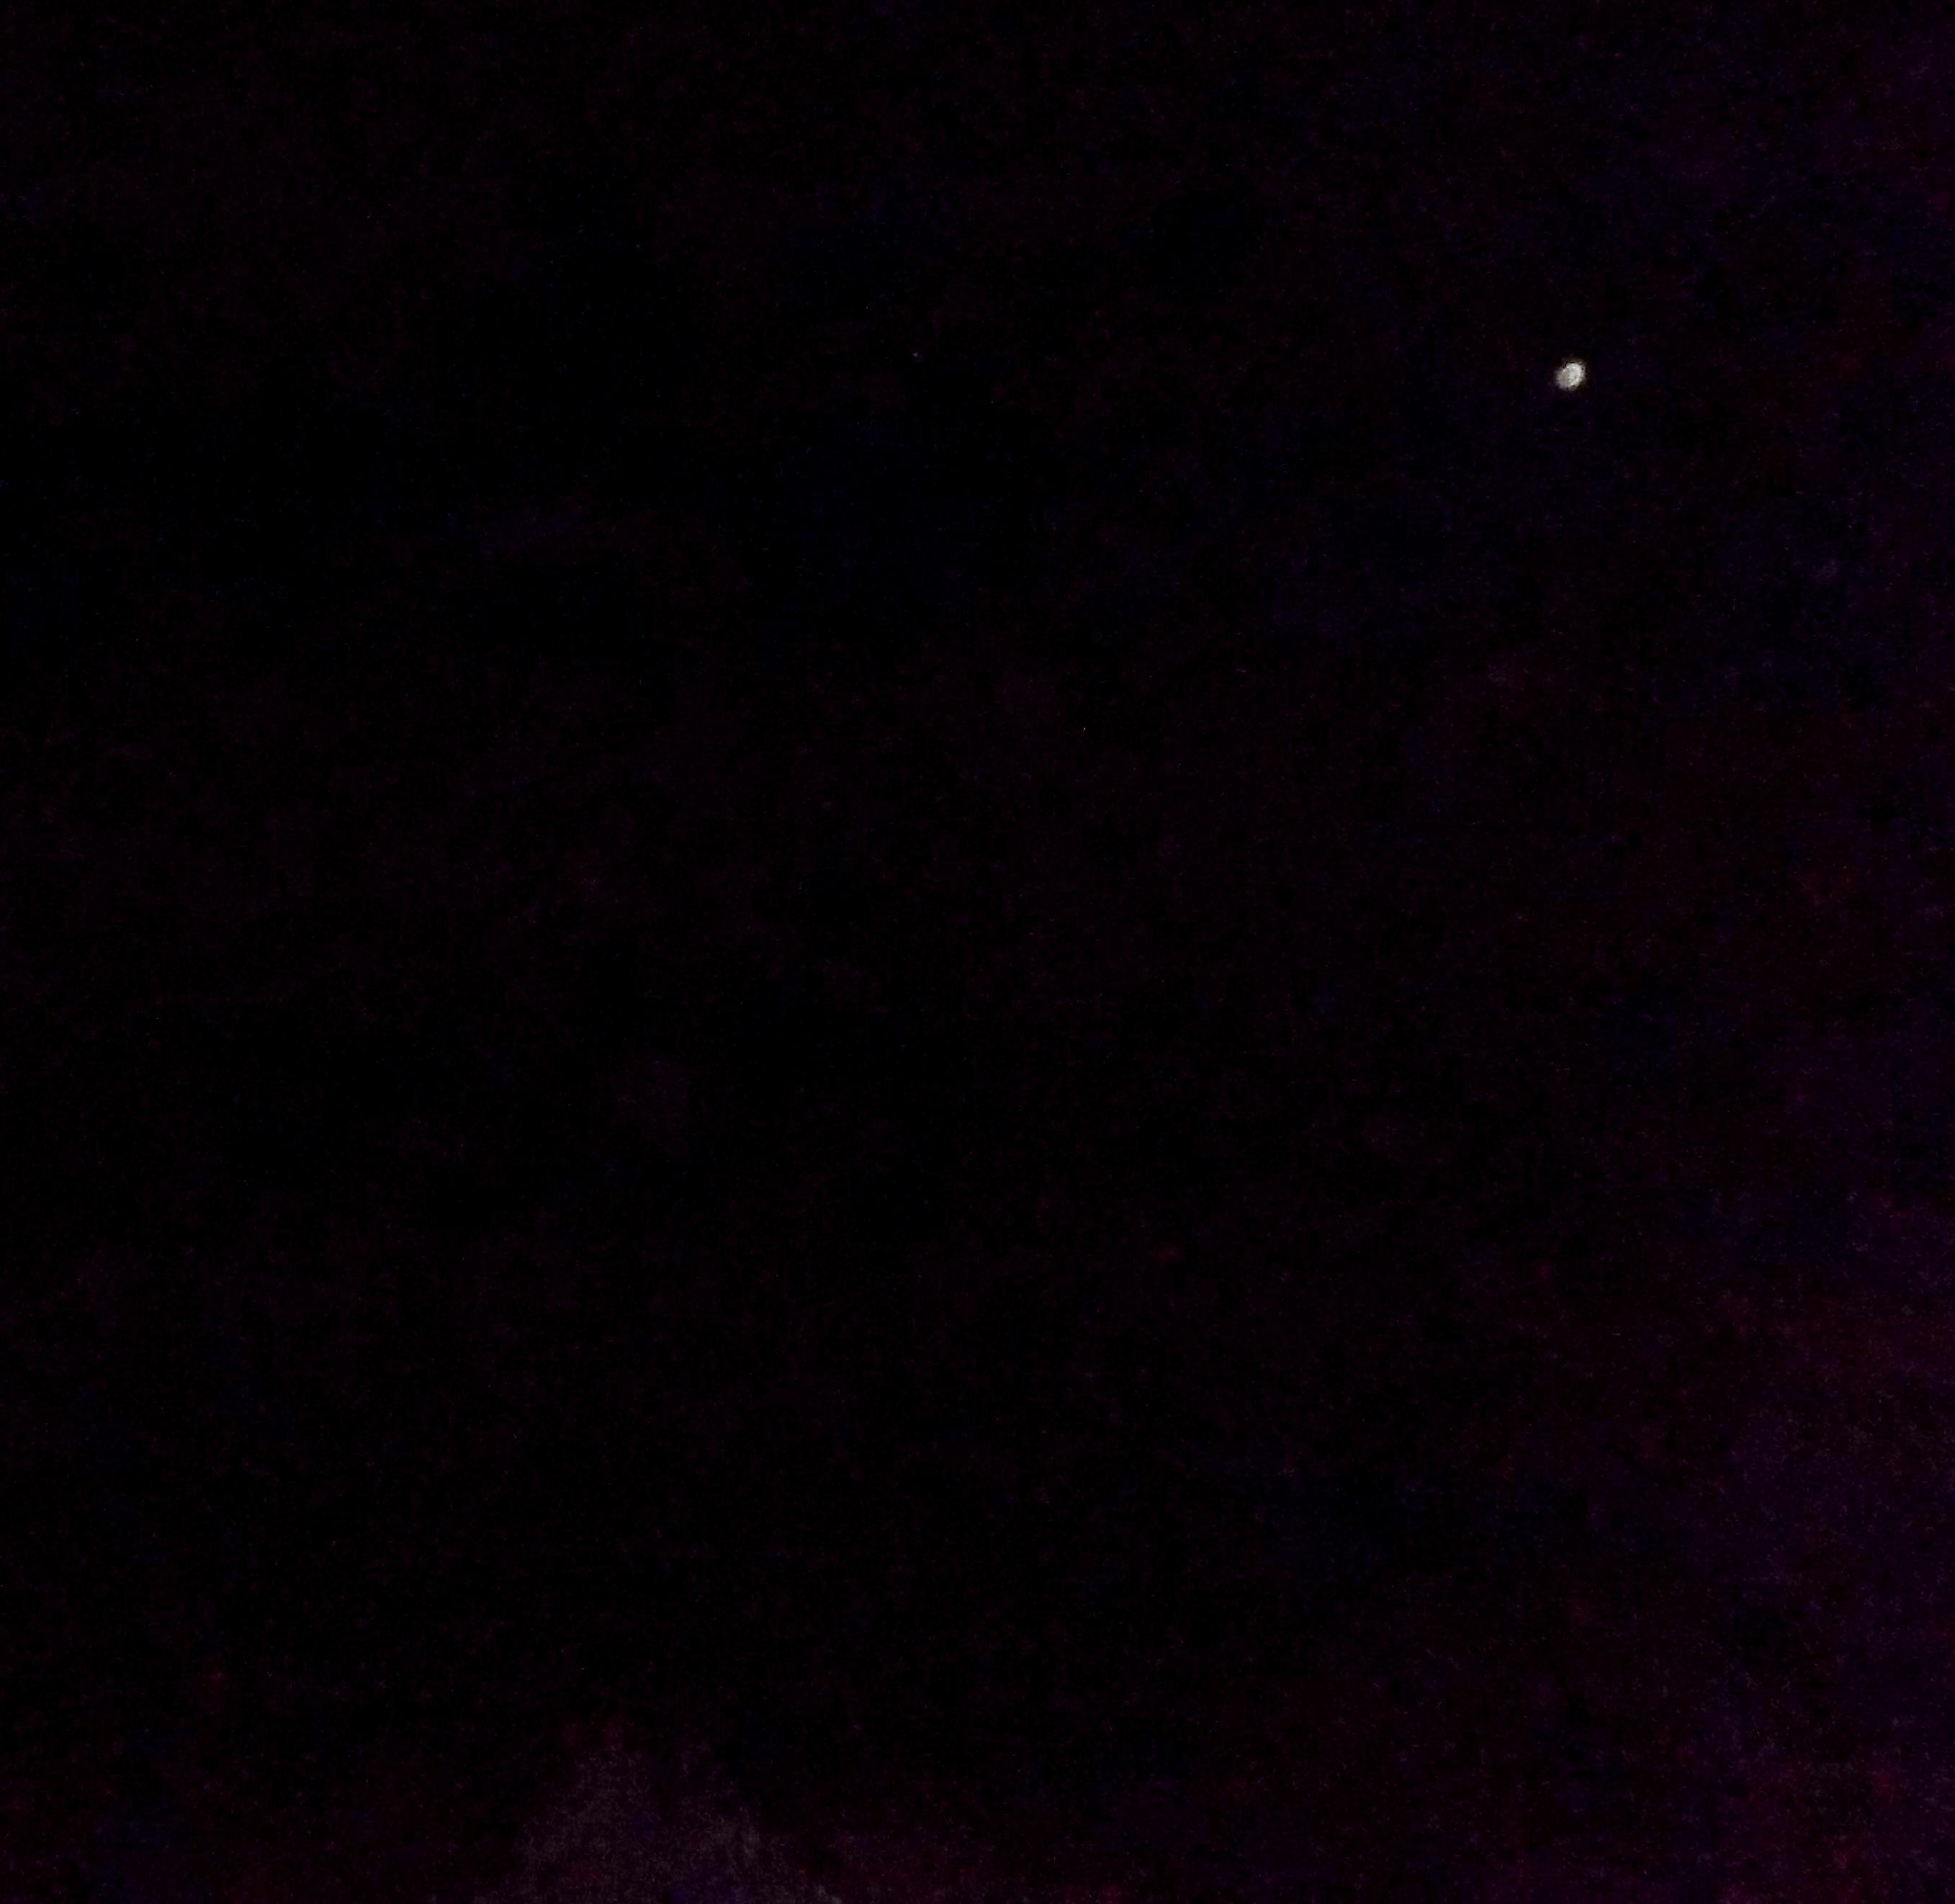 Alpha Centauri: the Pink Star